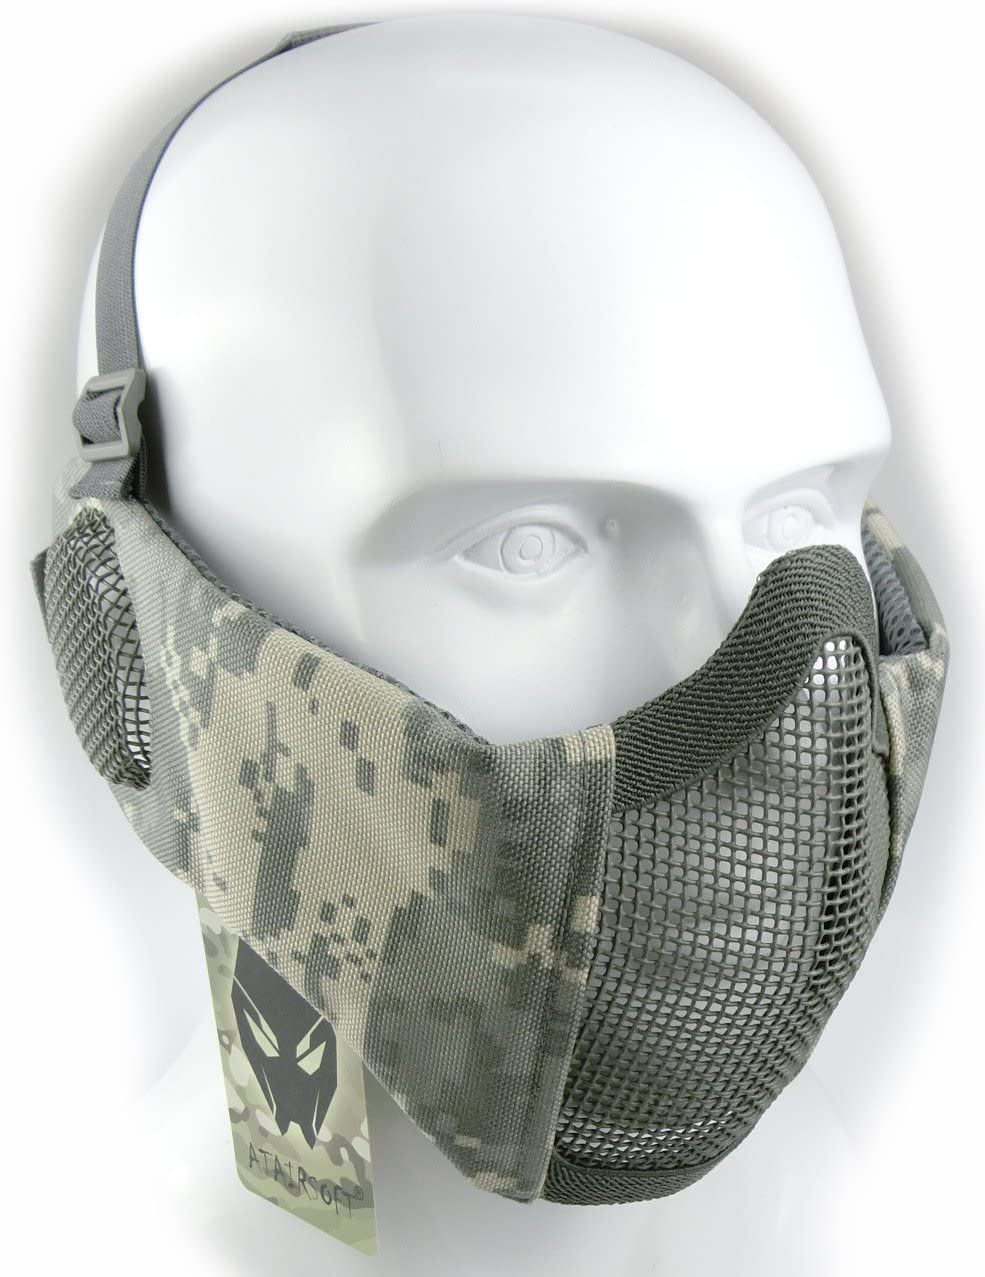 Mascarilla protectora de malla inferior de nailon con cubierta para la oreja de Worldshopping4U, Tactical Airsoft CS, delete